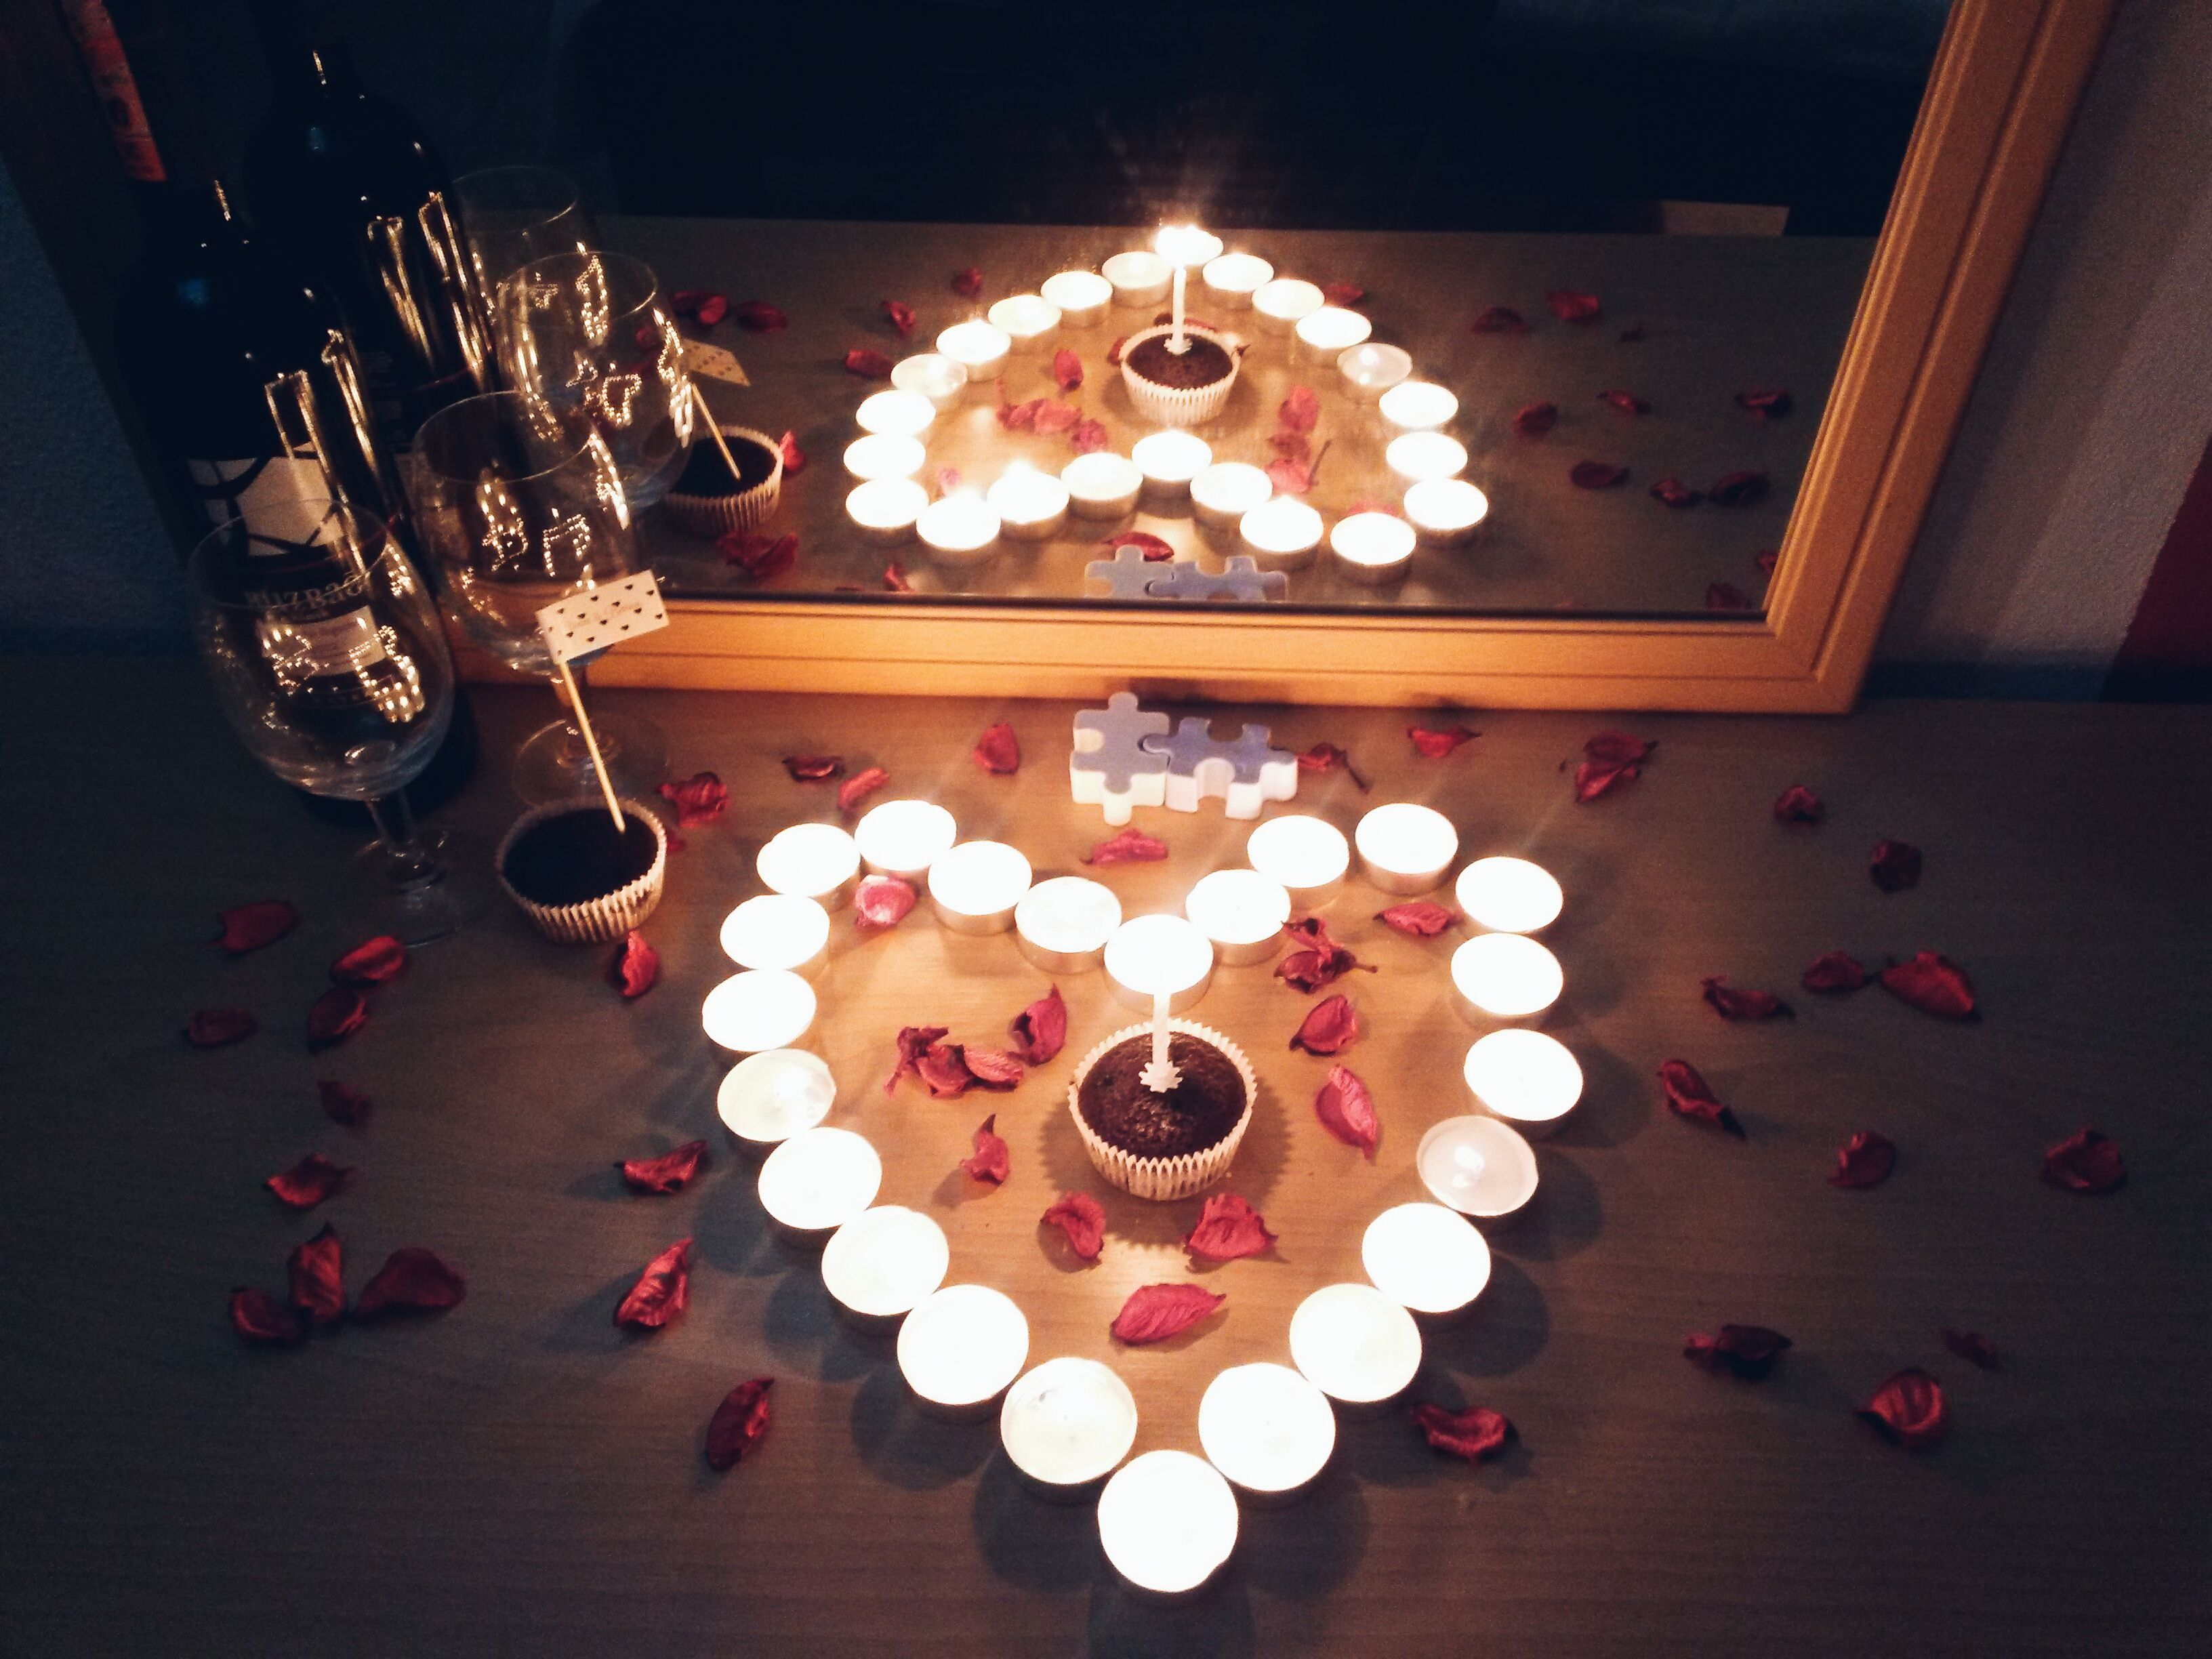 Birthday Suprise To Boyfriend Happy Birthday My Love Suprise For Boyfriend Happy Birthday My Love Suprise Idea For Boyfriend